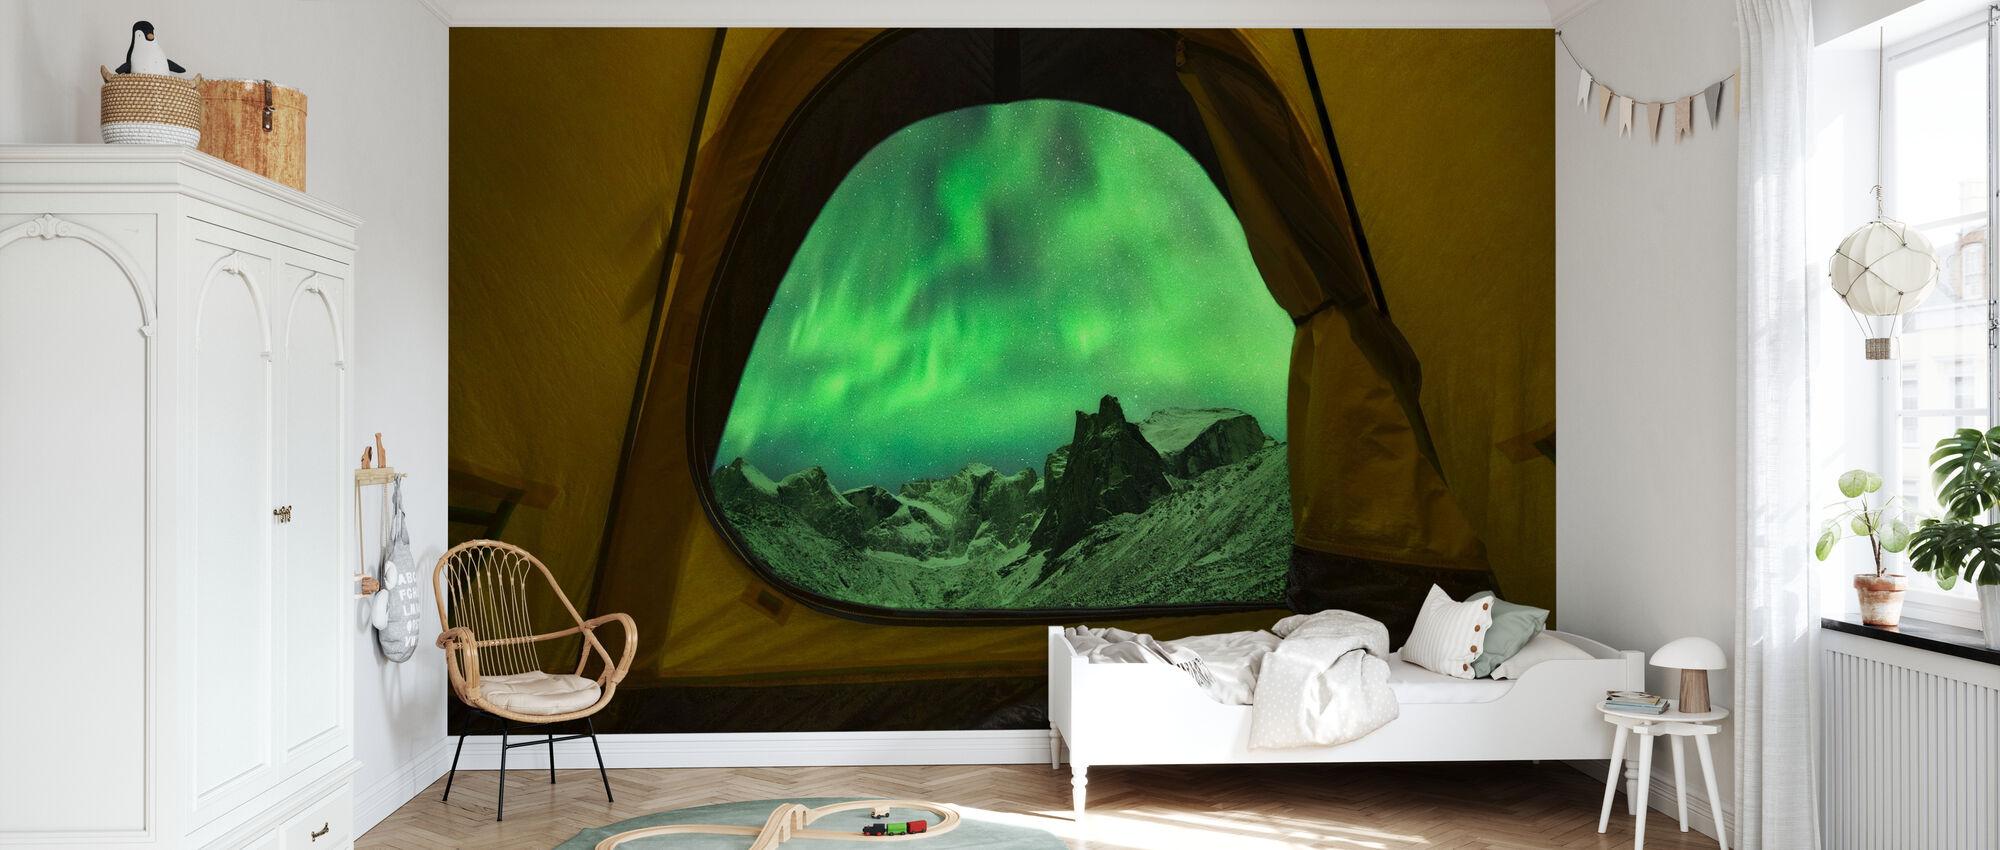 Aurora Borealis Seen from Tent, Alaska - Wallpaper - Kids Room